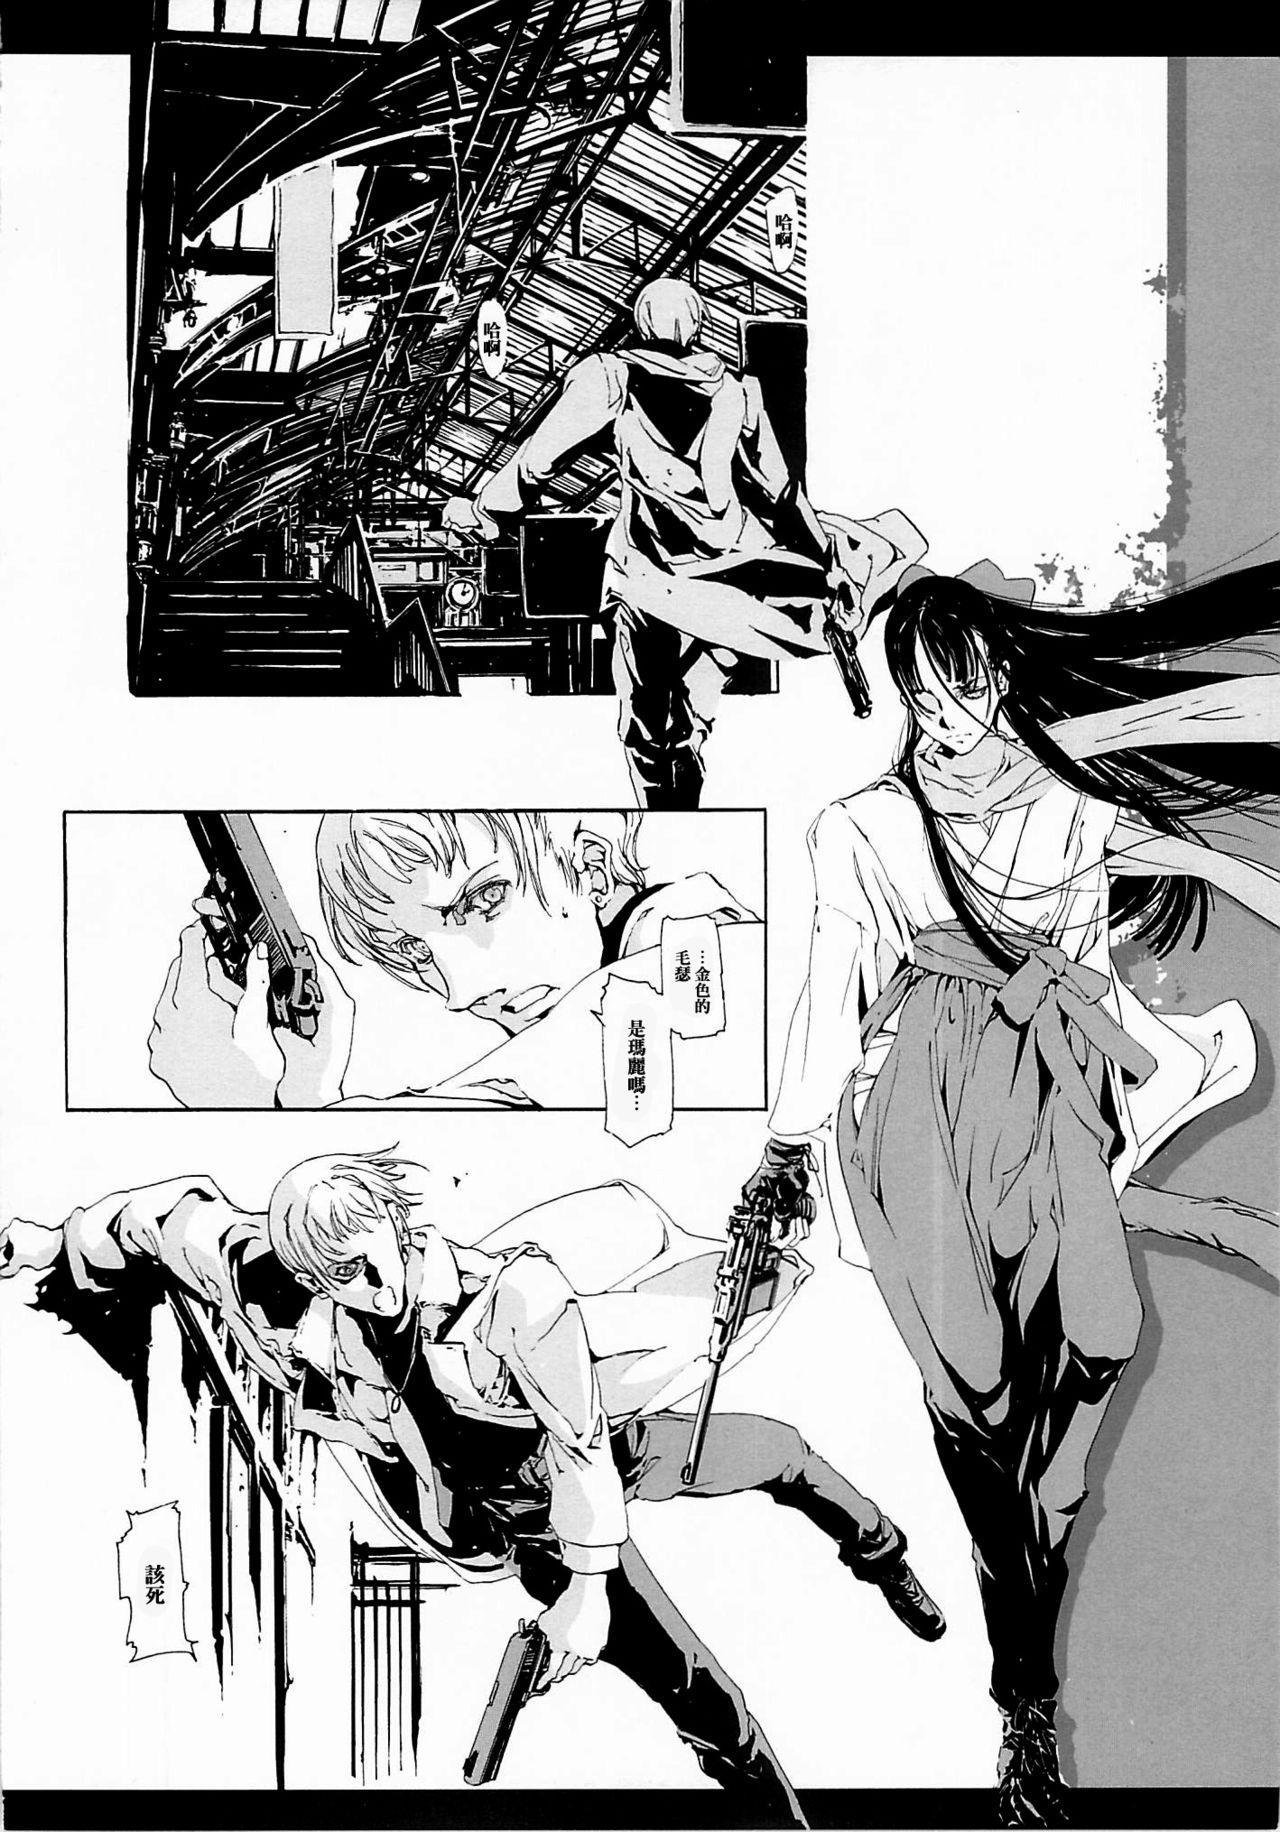 (CR37) [70 Nenshiki Yuukyuu Kikan (Endou Okito)] ORGAN-Tino  01-02[Chinese] [拾荒者汉化组] [Incomplete] 38